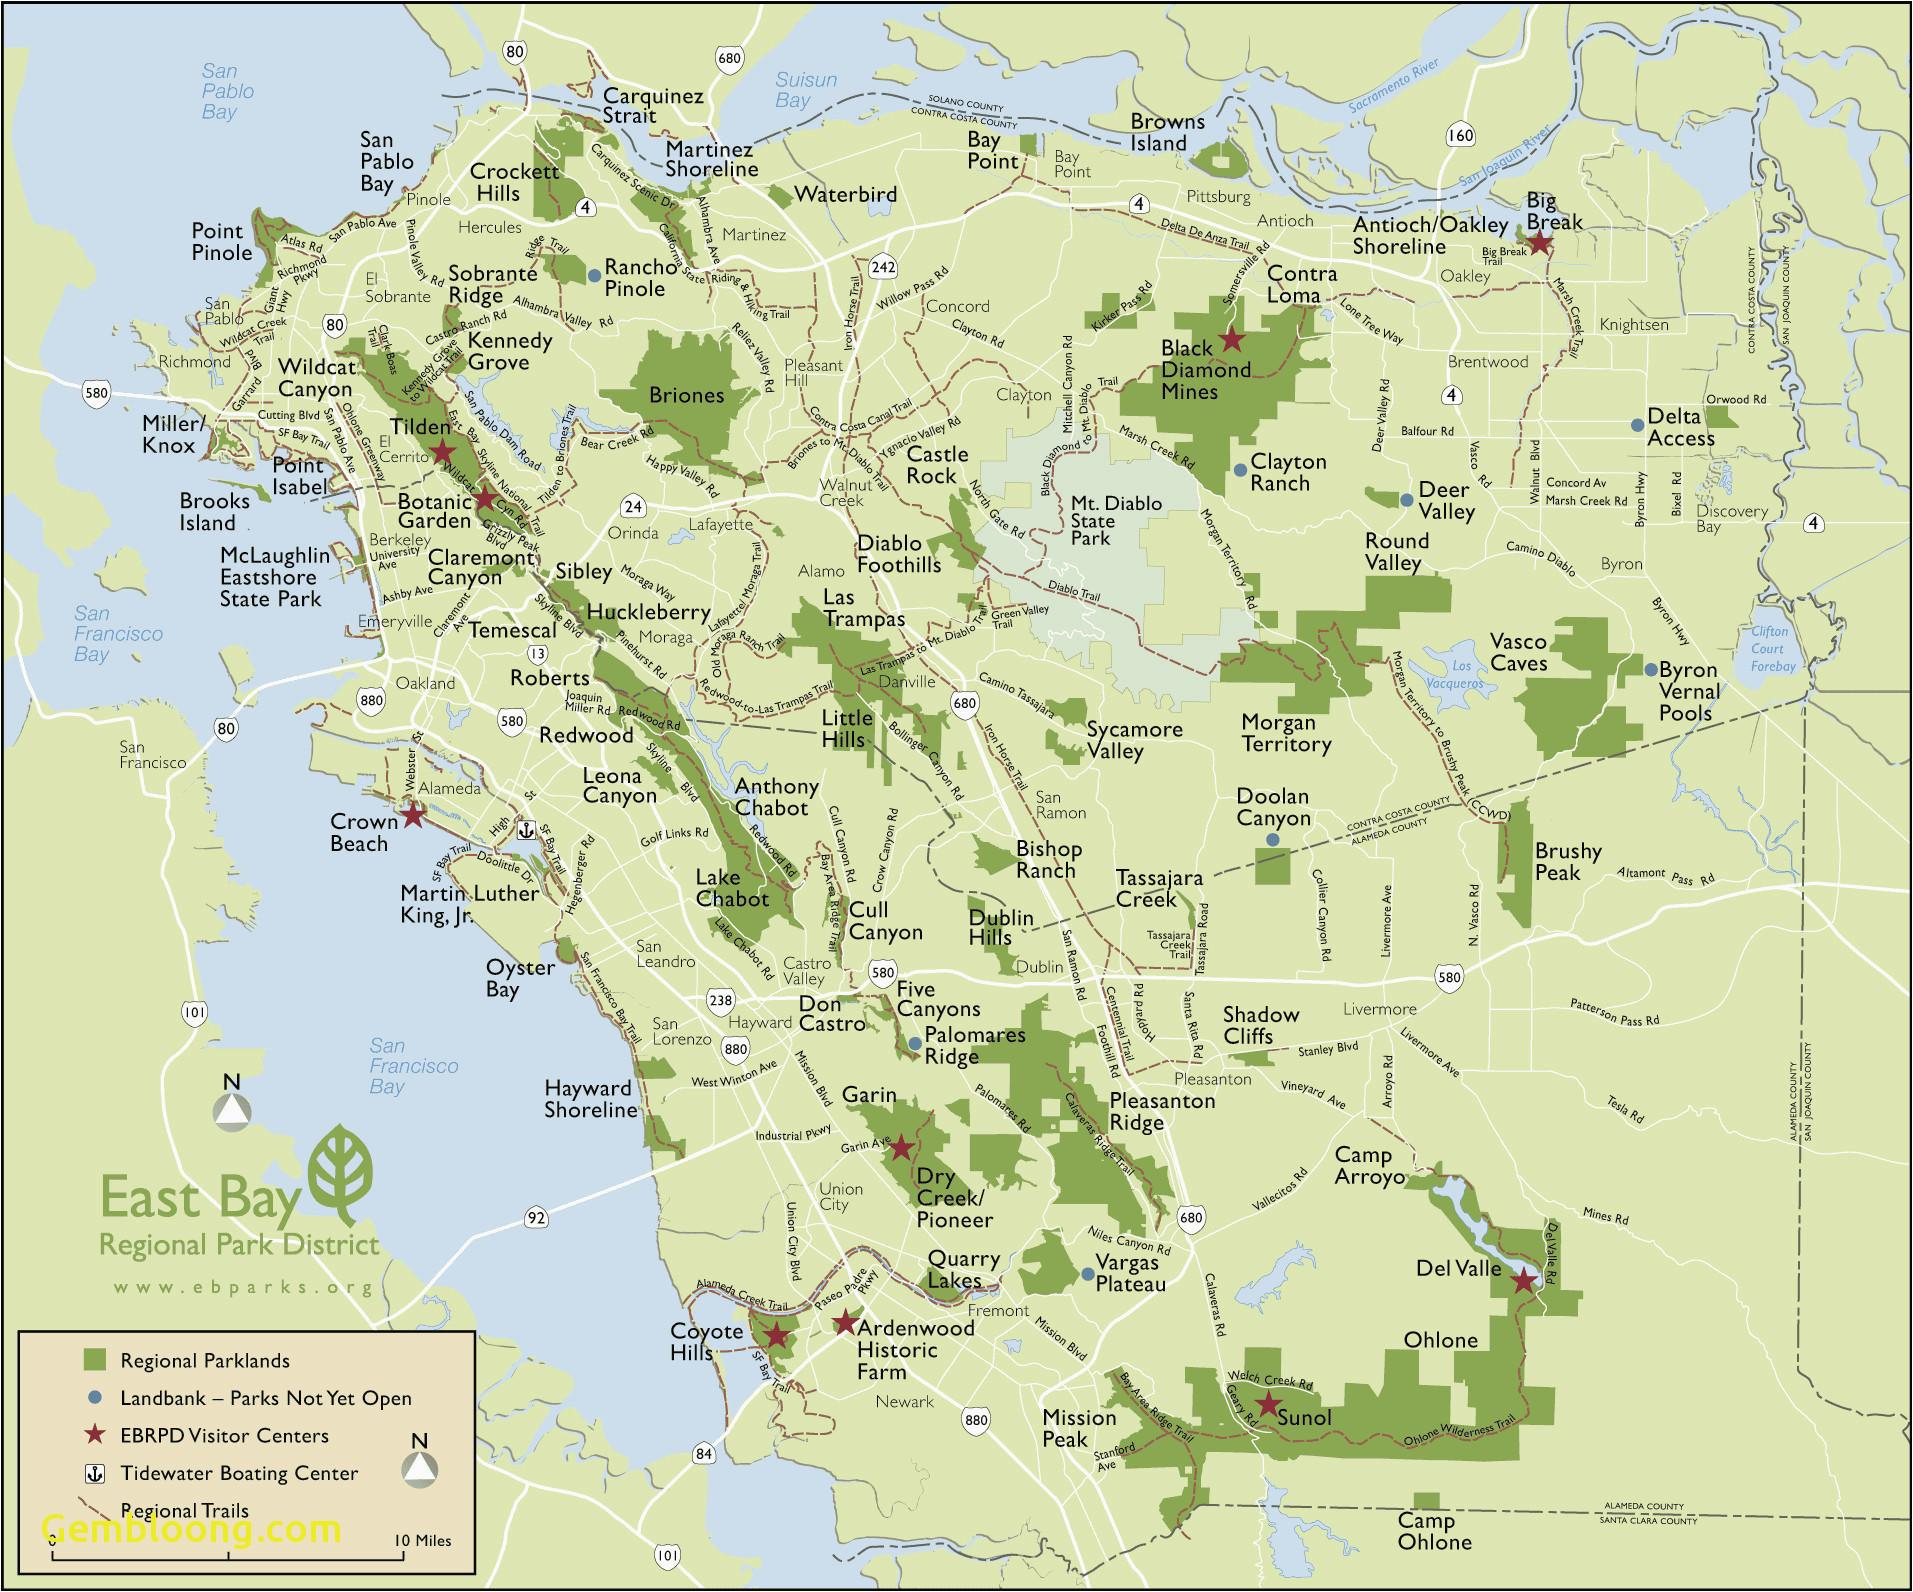 santa monica map unique interstate 16 i 16 map usa macon georgia to